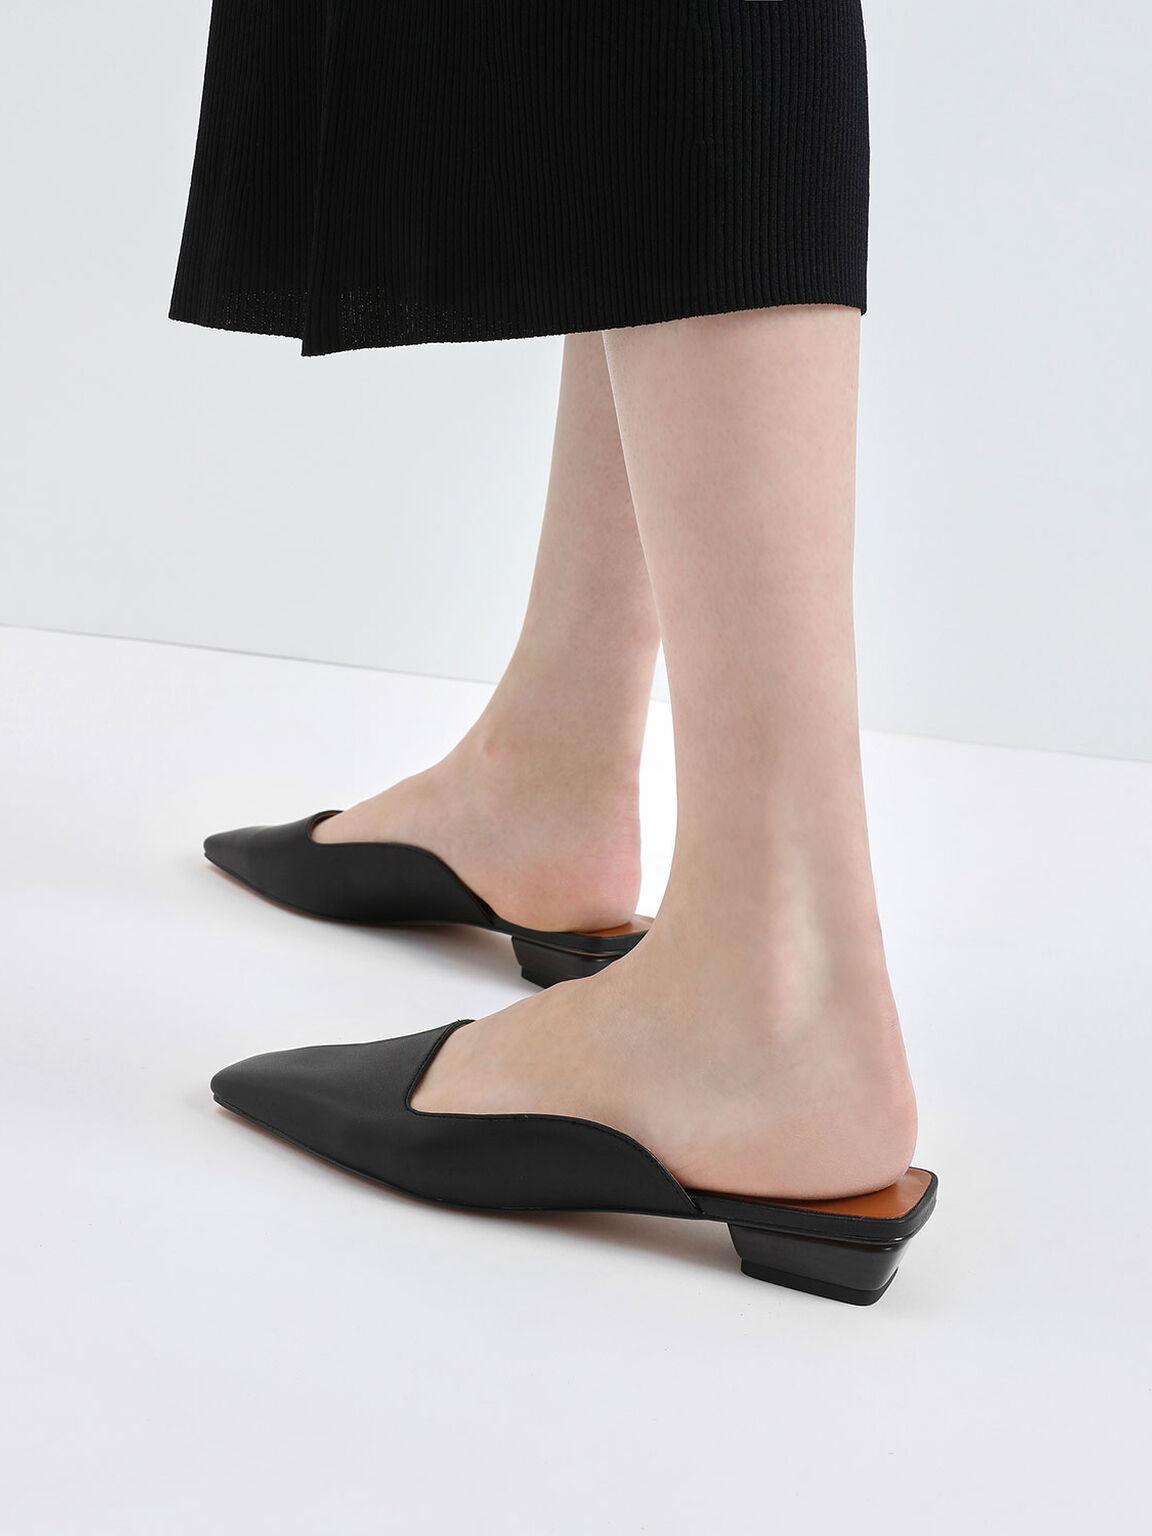 Square Toe Stacked Heel Mules, Black, hi-res